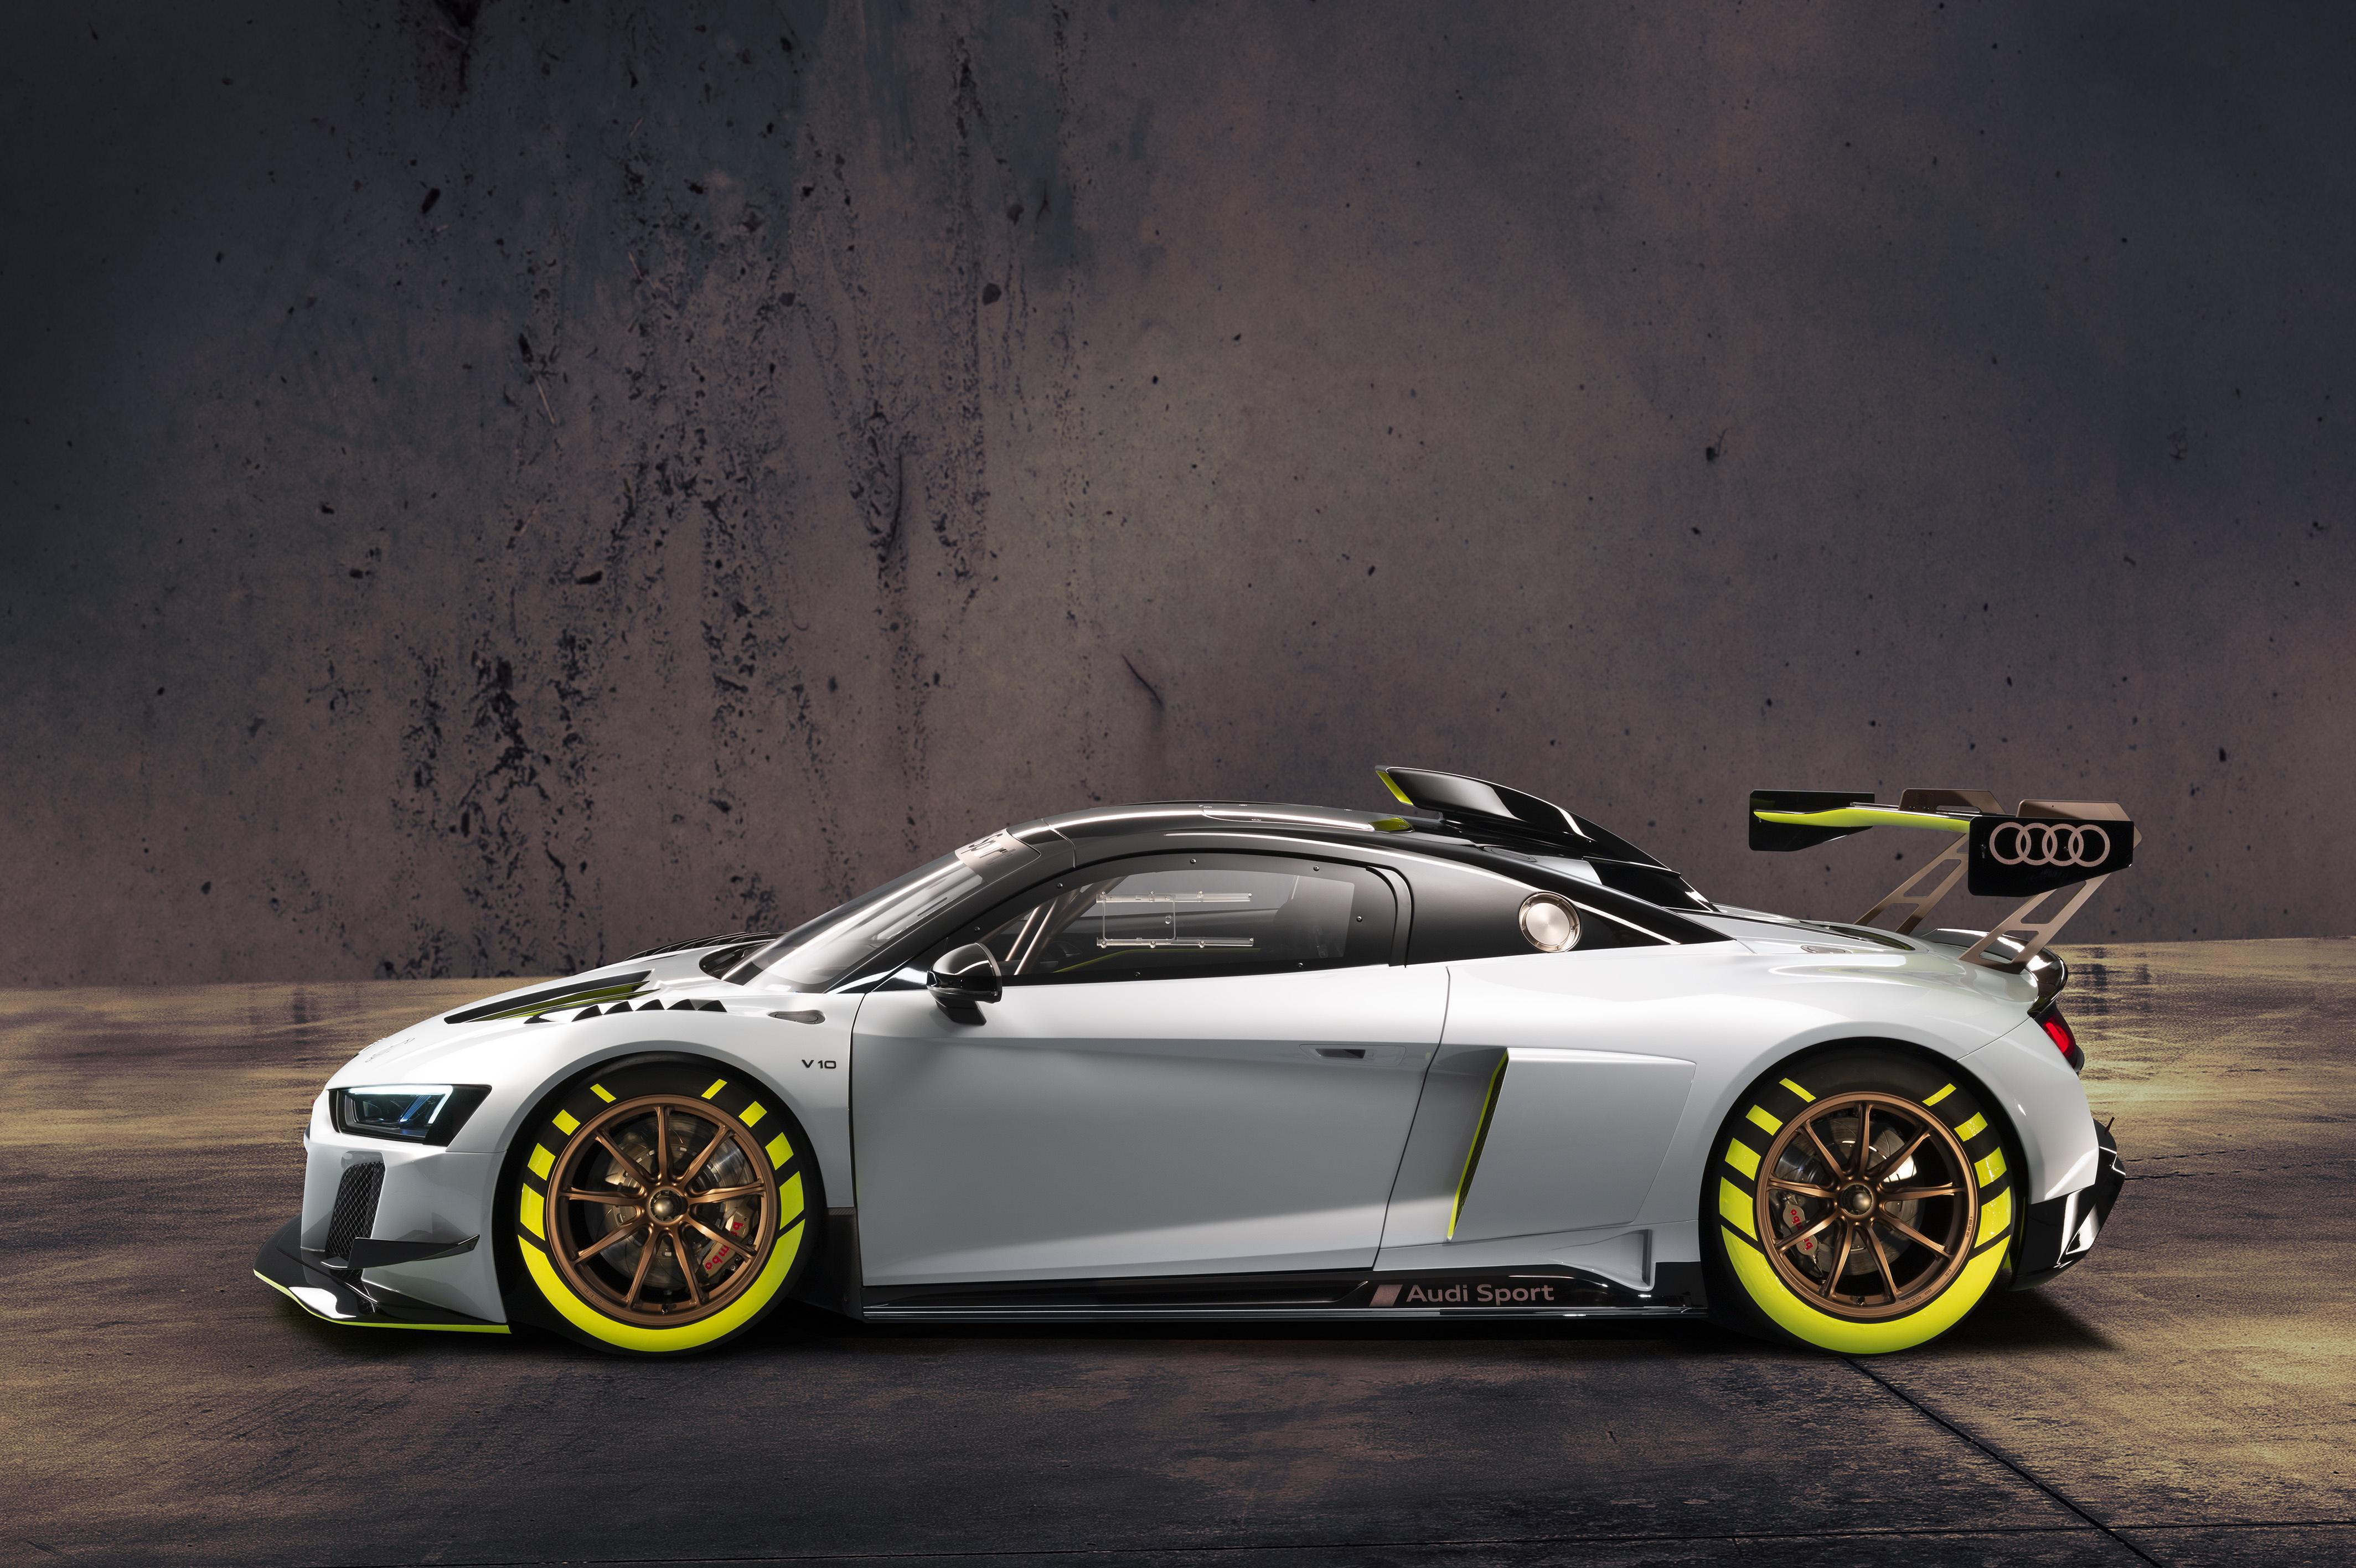 2020 Audi R8 LMS GT2 4k Ultra HD Wallpaper Background Image 4256x2833